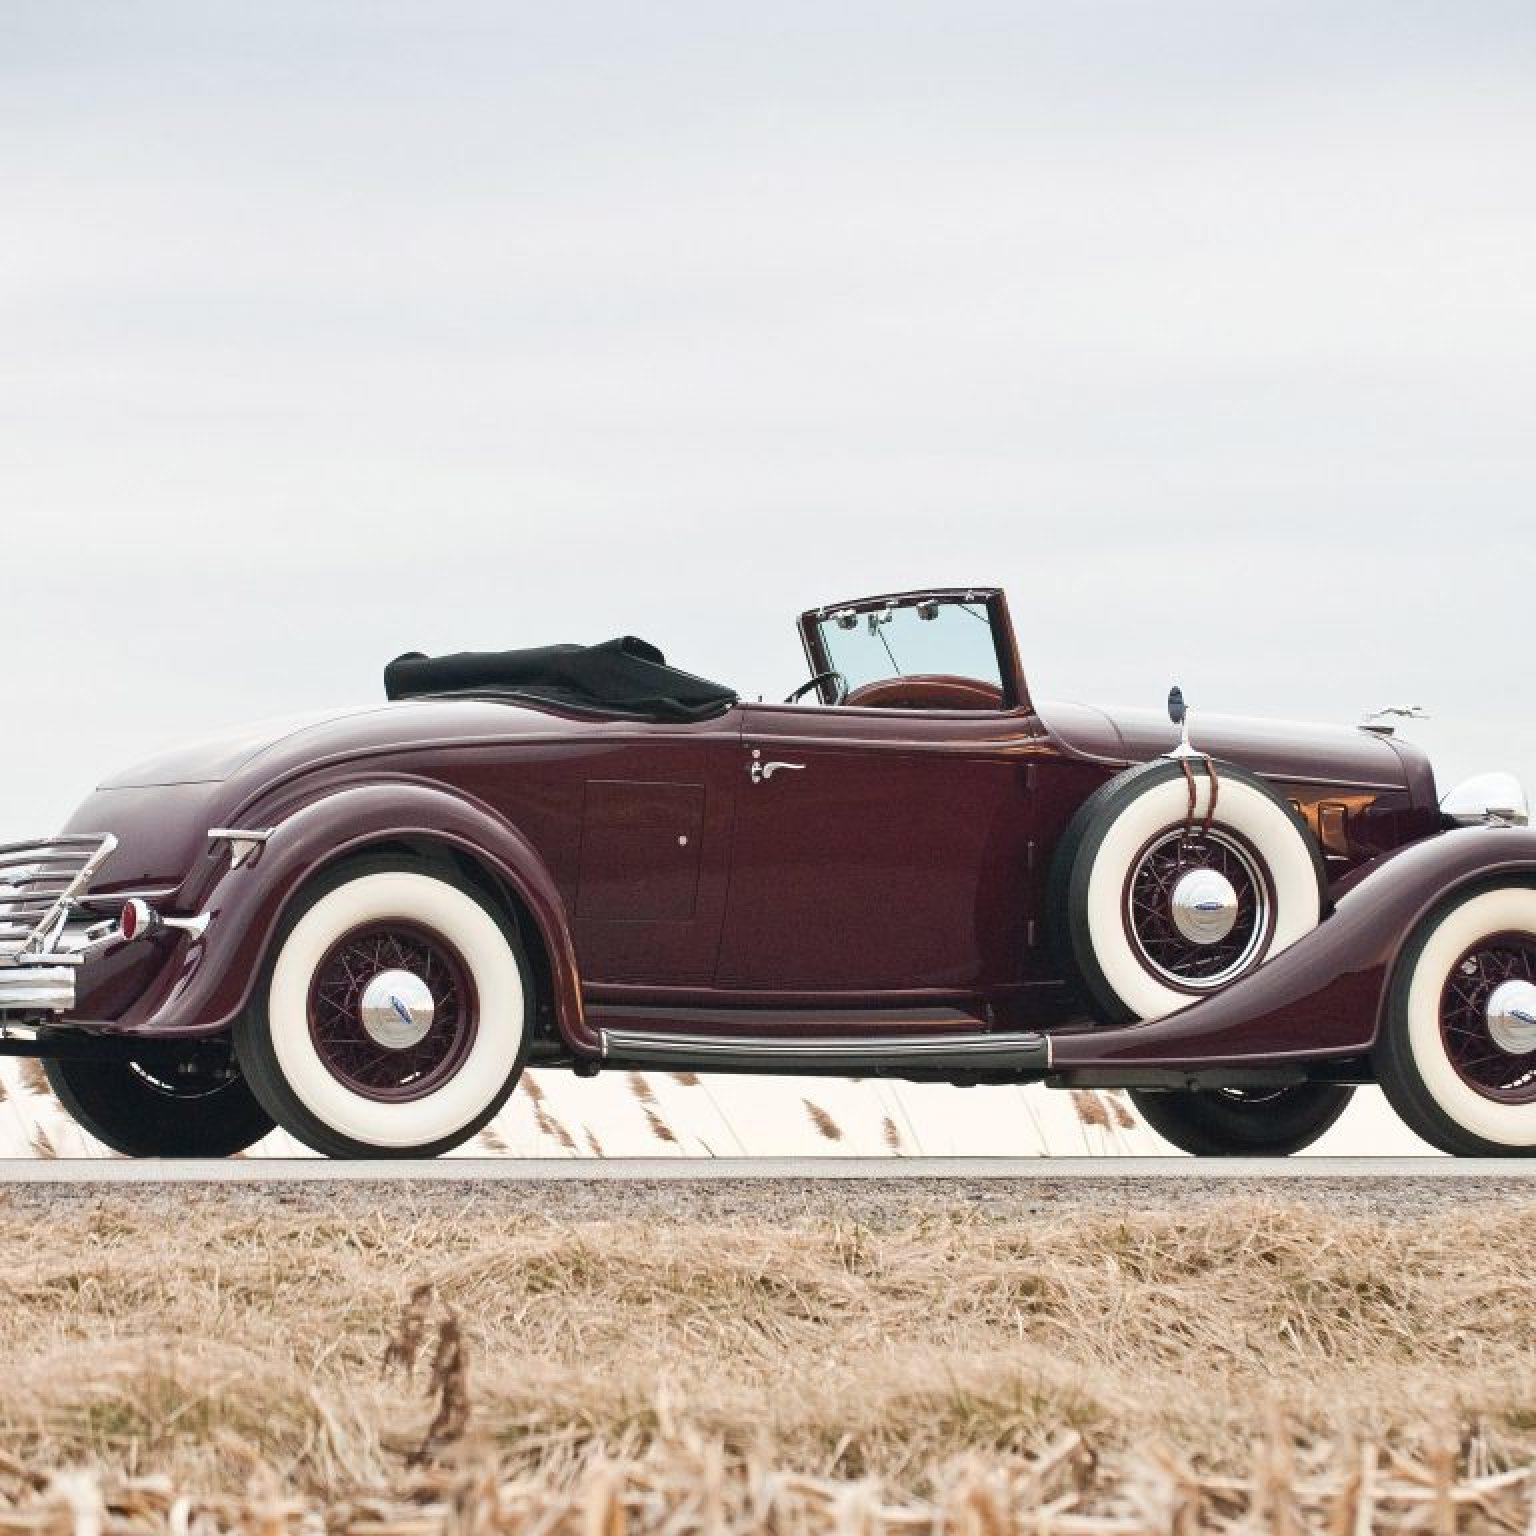 1934 Lincoln Model KA Convertible Roadster